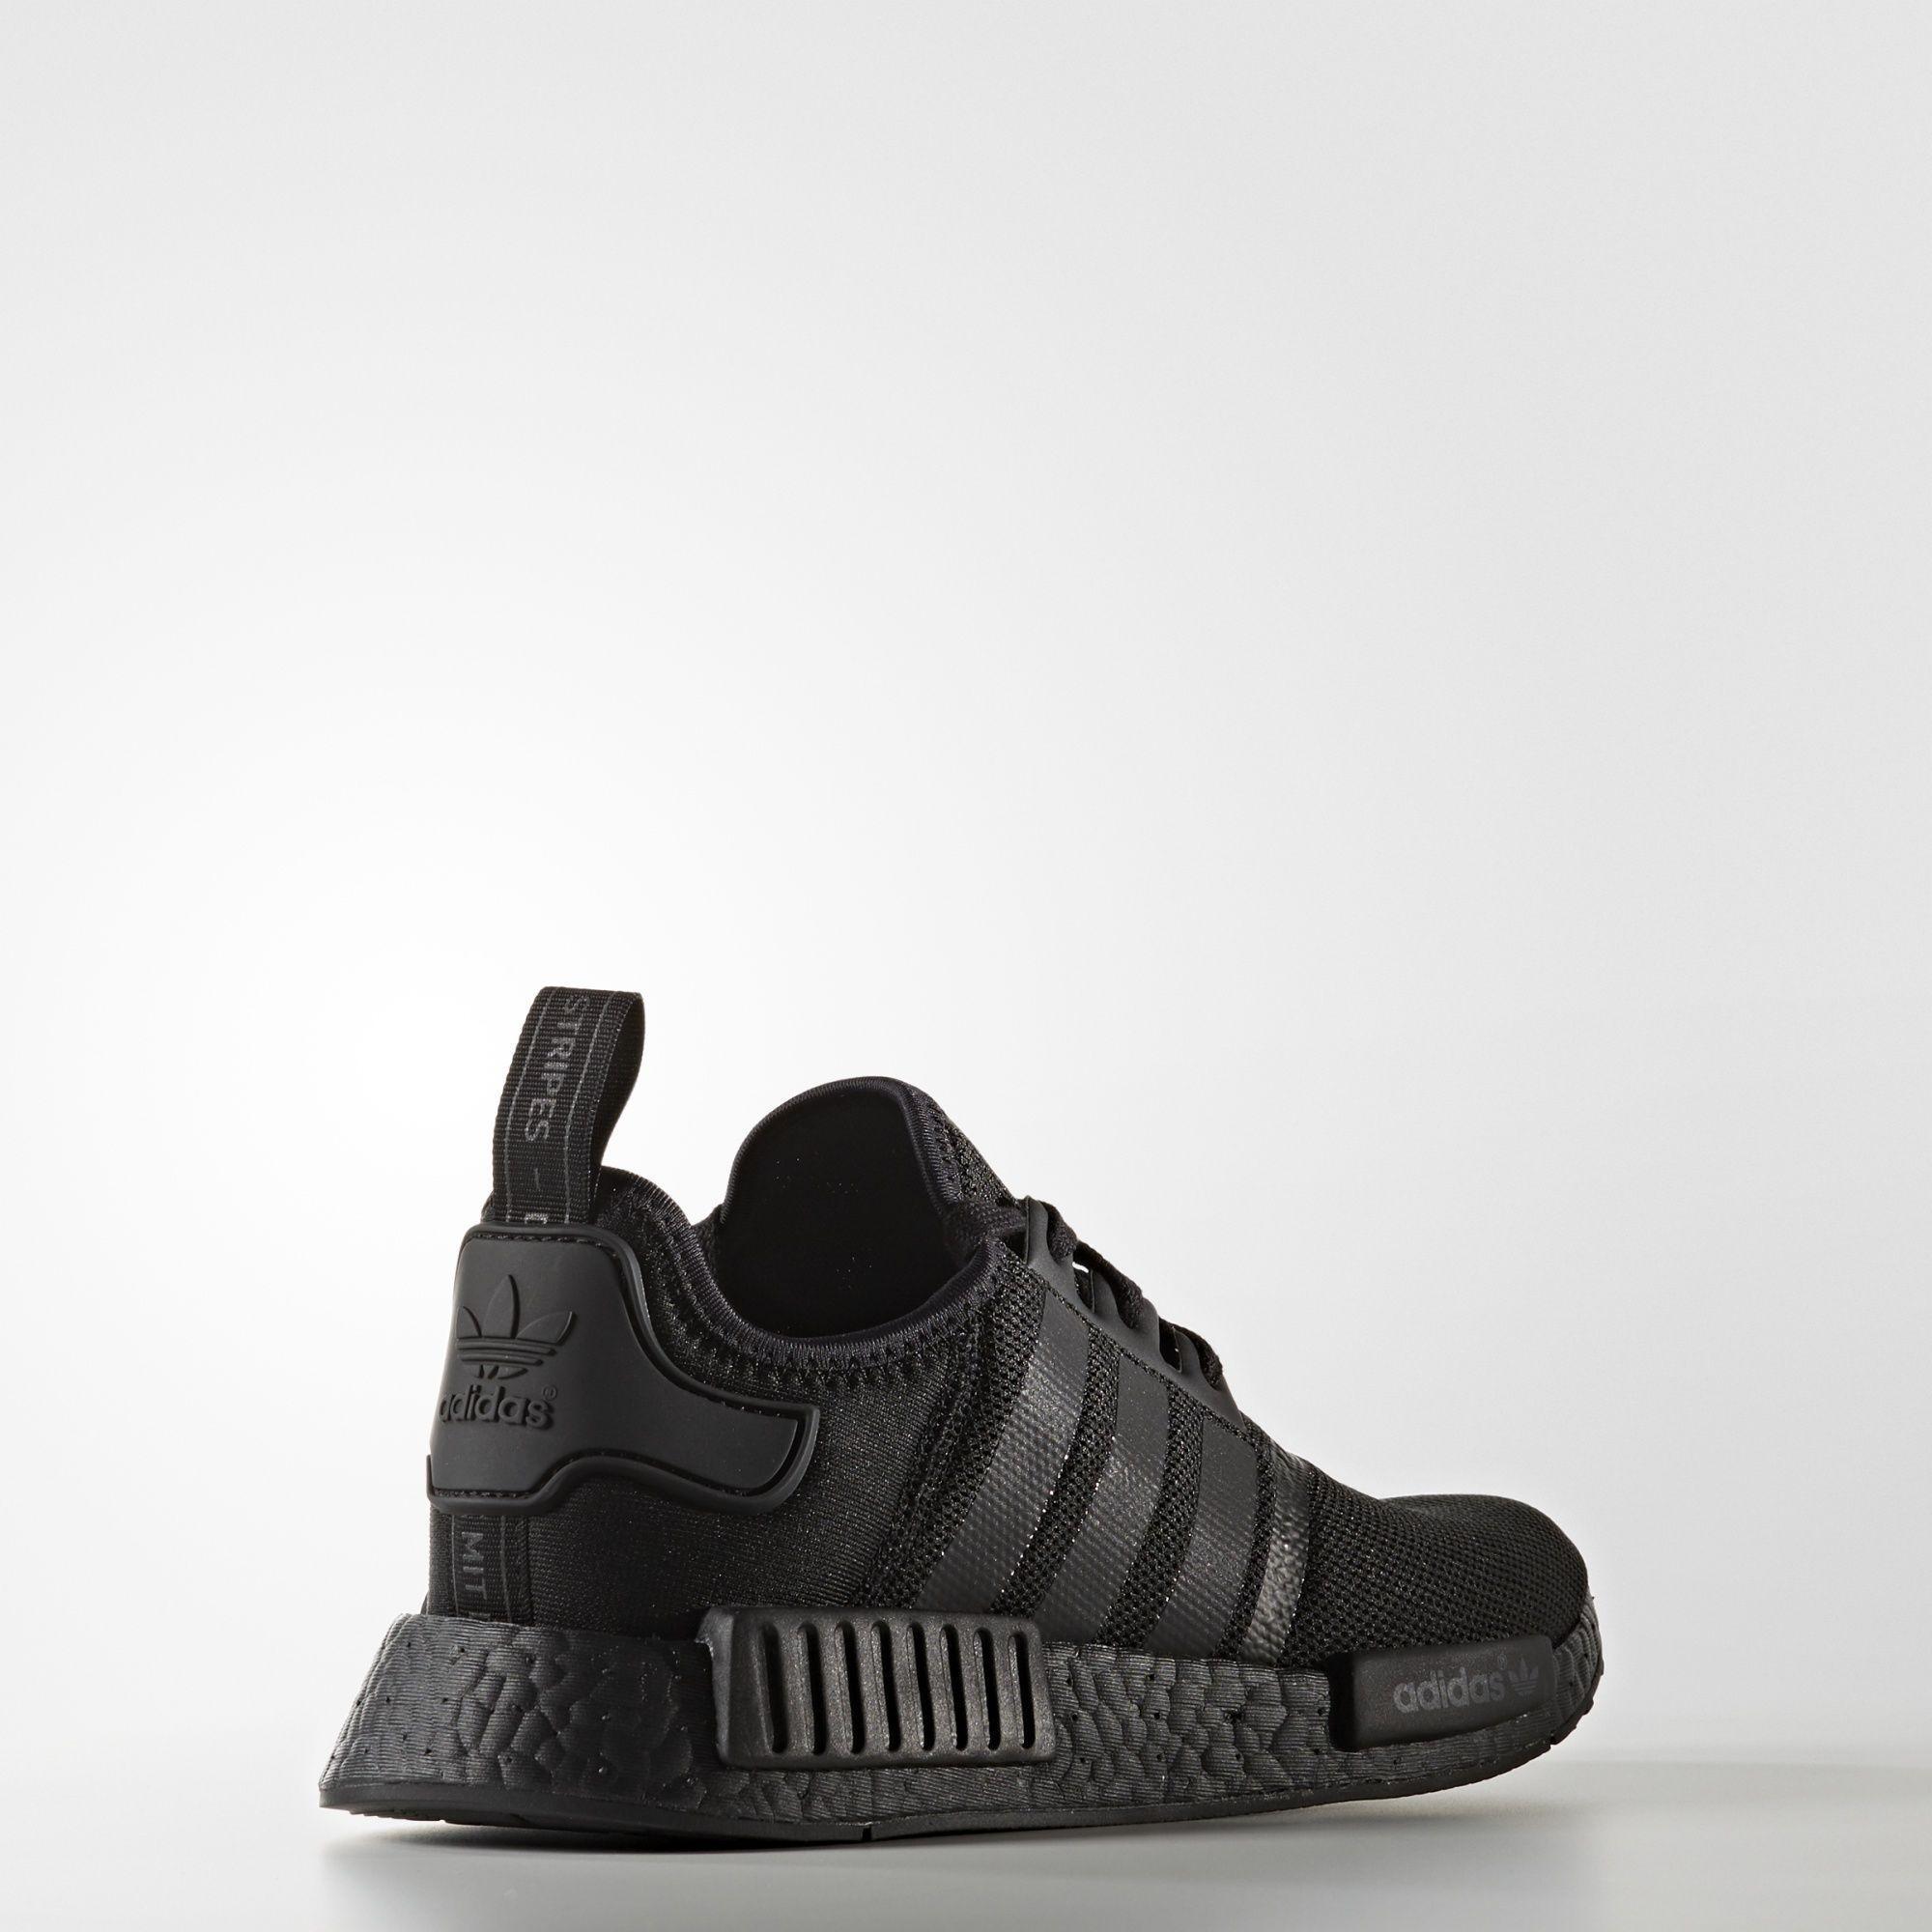 27fd22460c295 adidas - NMD R1 Shoes